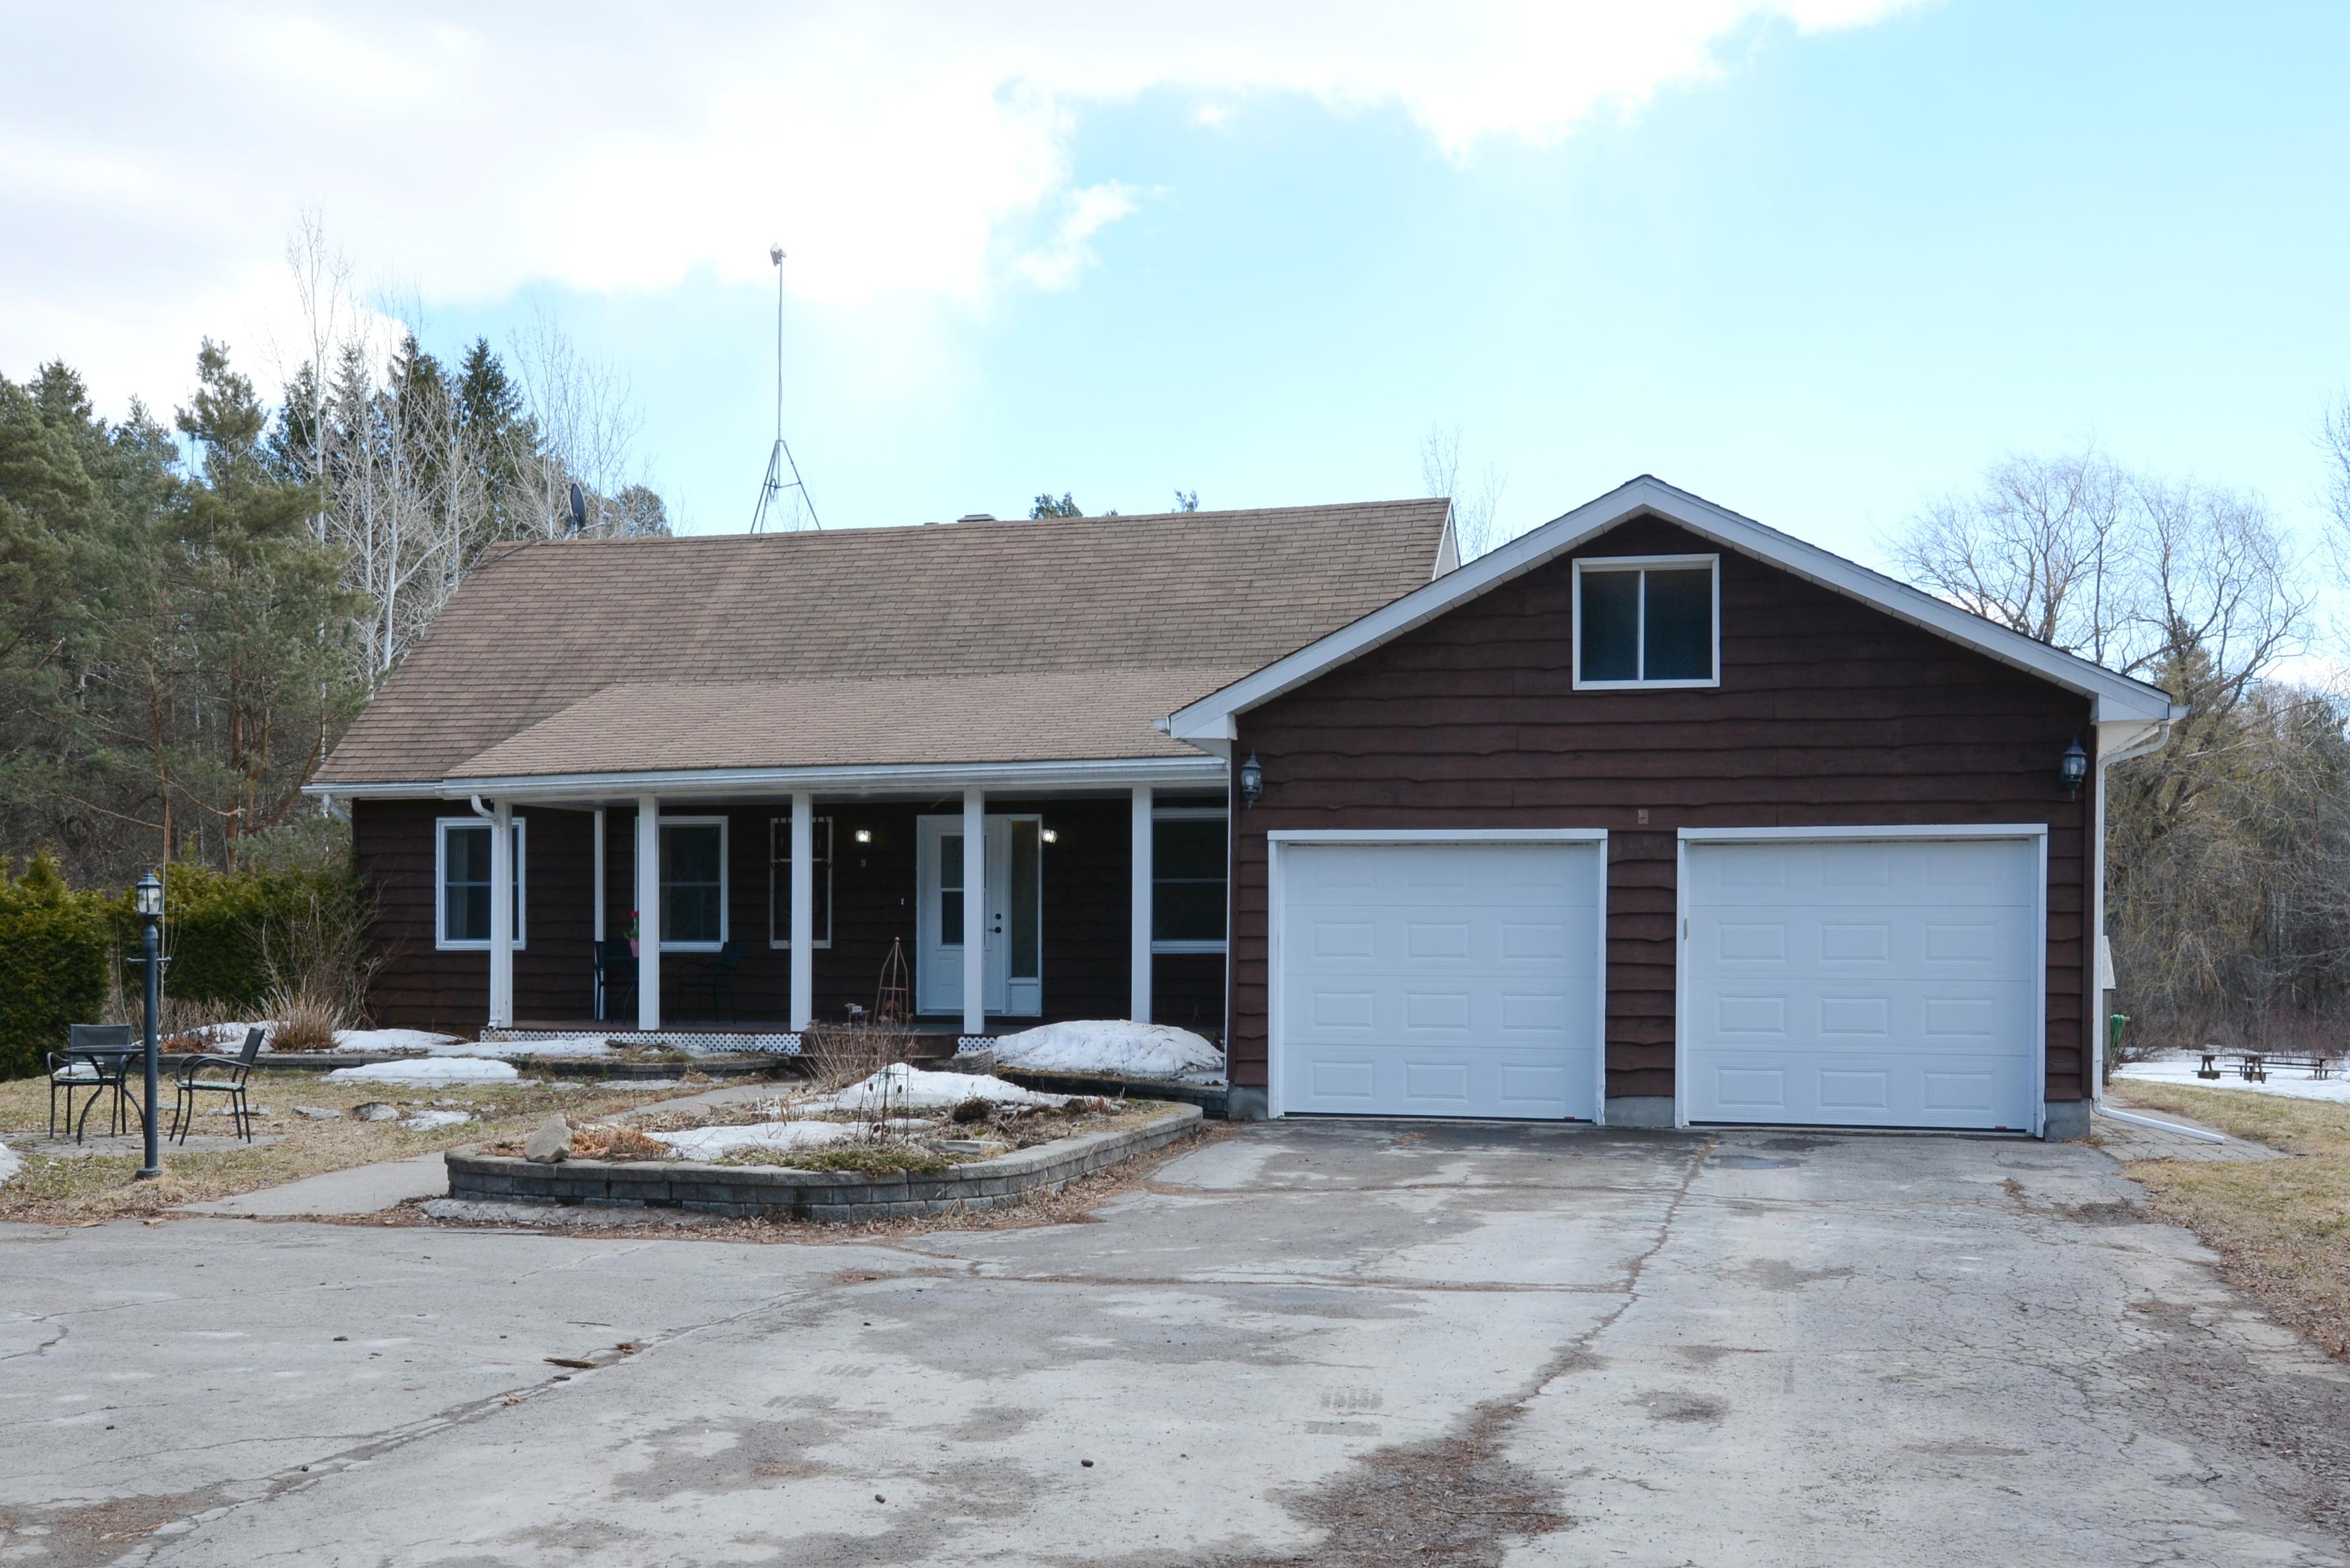 2550 Mcgovern Rd W, Kemptville, Ontario  K0G 1S0 - Photo 1 - RP830008536